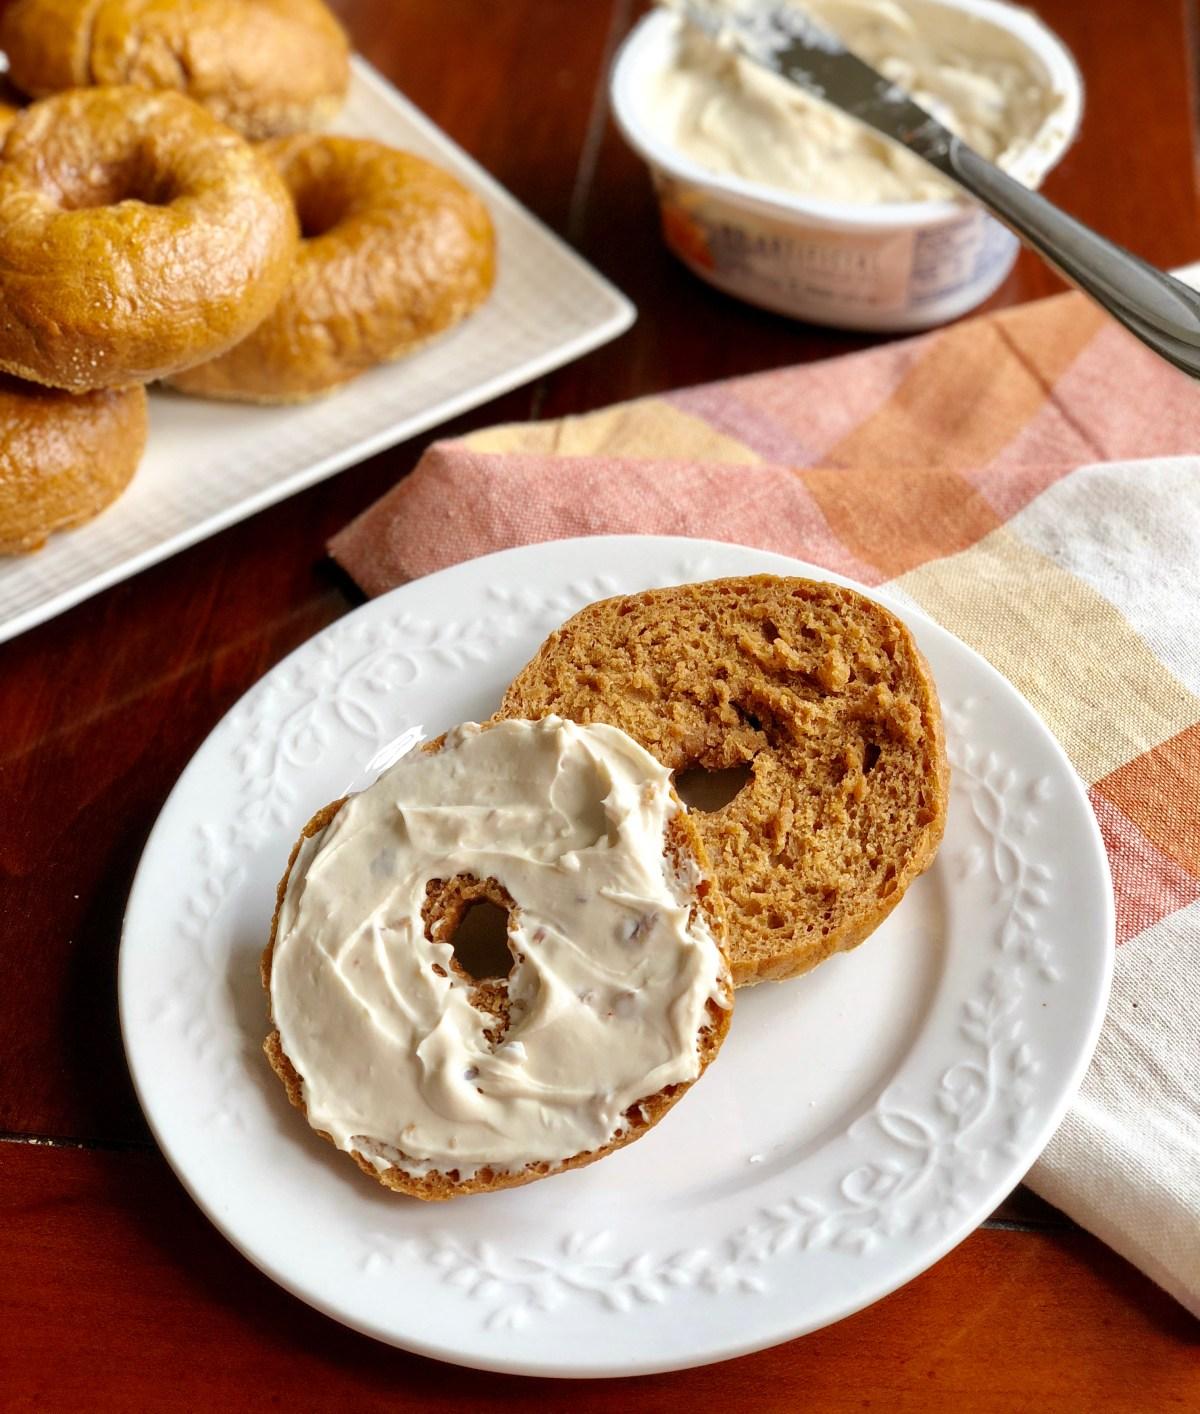 Pumpkin Spice Bagels by Happylifeblogspot.com #pumpkinbagels #pumpkinspicebagels #bagels #howtomakebagels #fallbaking